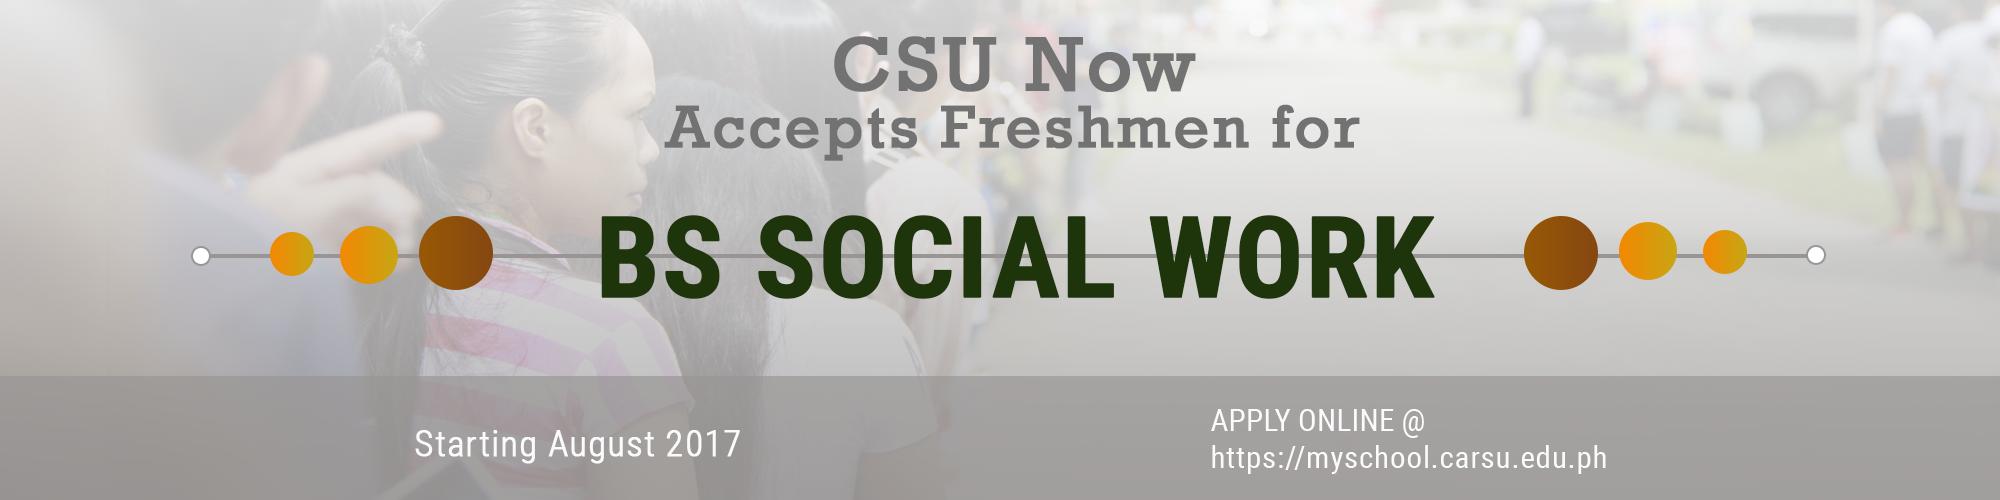 CSU BS Social Work